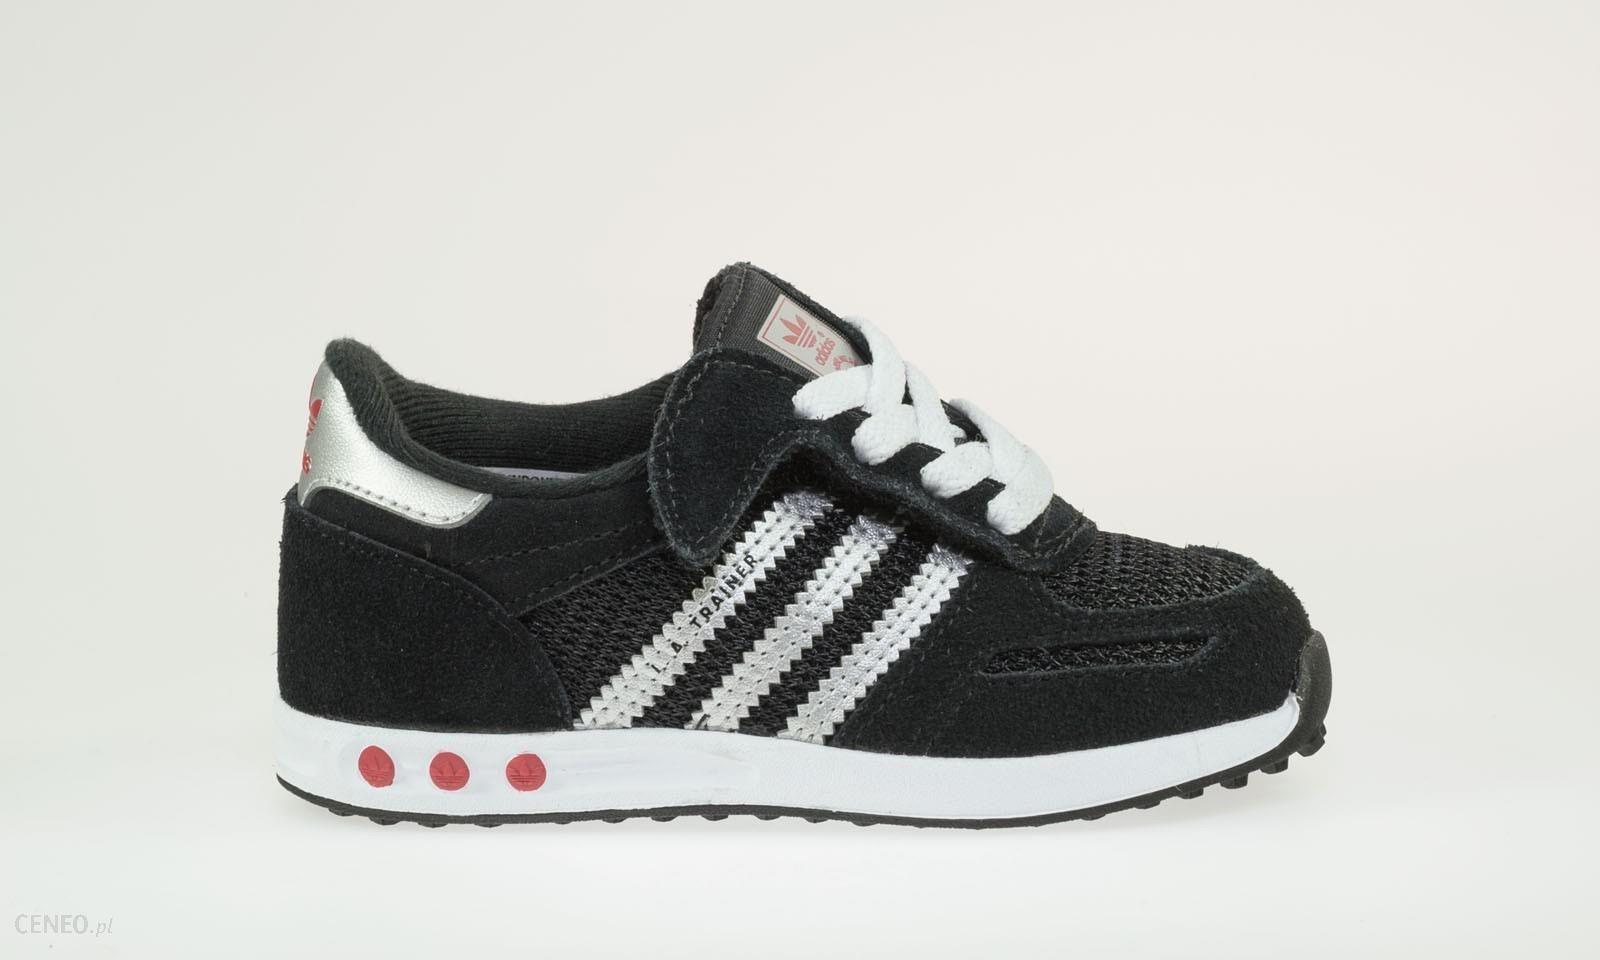 Adidas La Trainer J 157 niebieskie   Adidas, Buty i Buty adidas